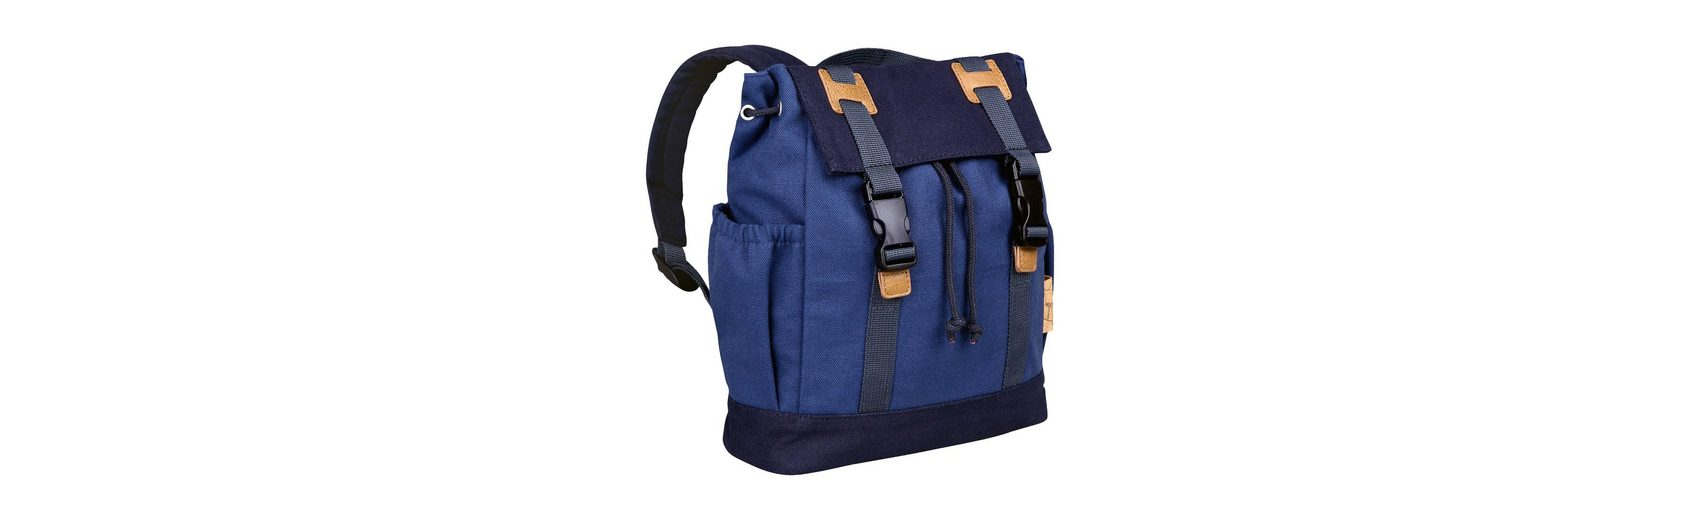 Lässig Wickelrucksack Little One & Me Backpack small, blue